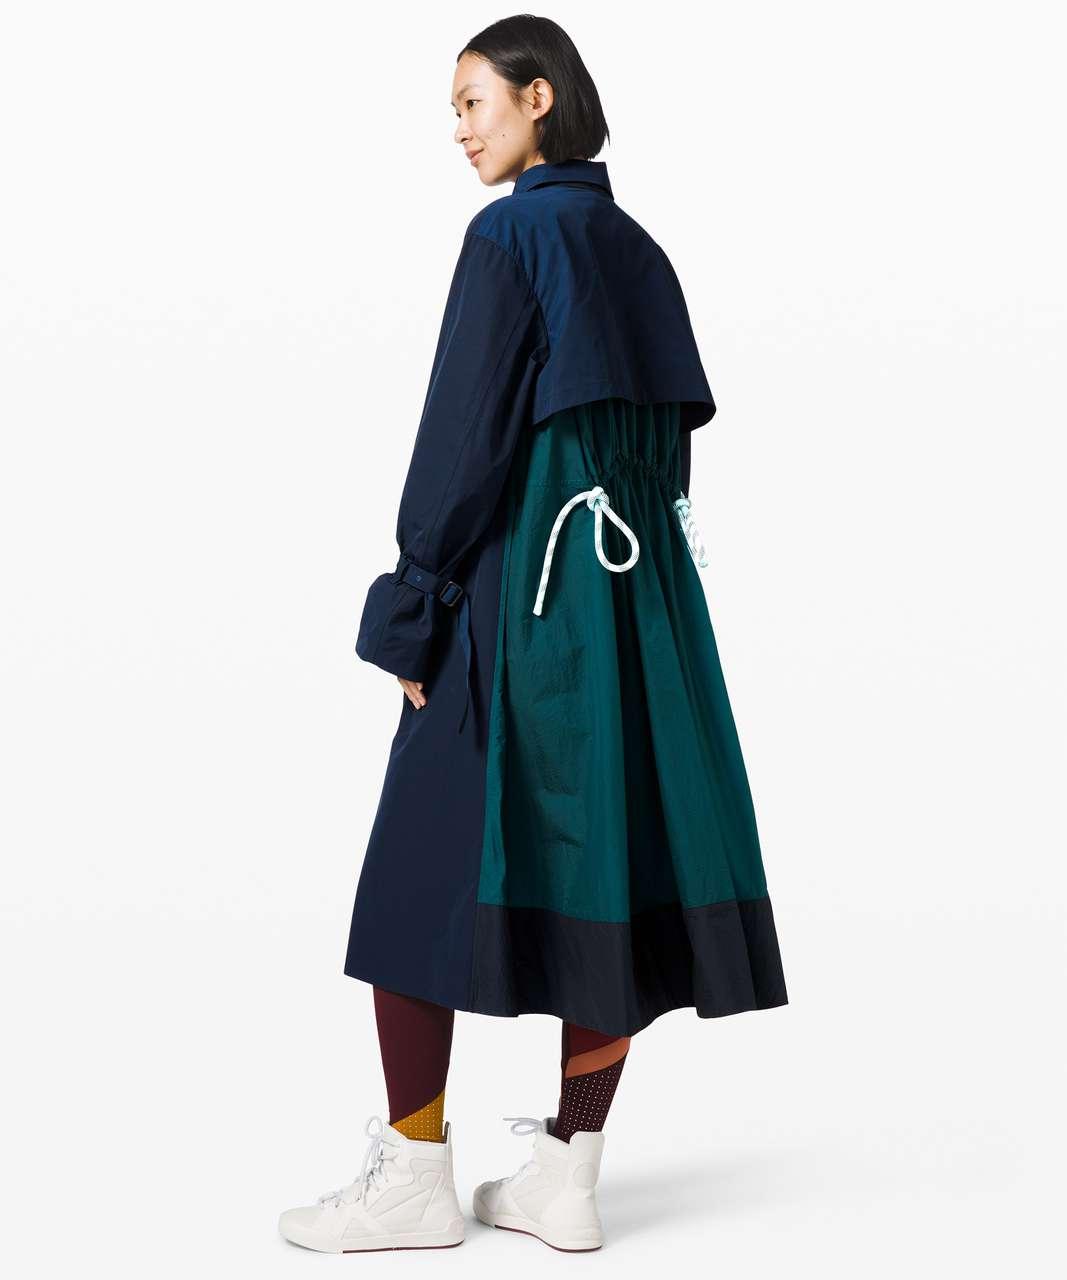 Lululemon Face Forward Trench Coat *lululemon x Roksanda - True Navy / Emerald